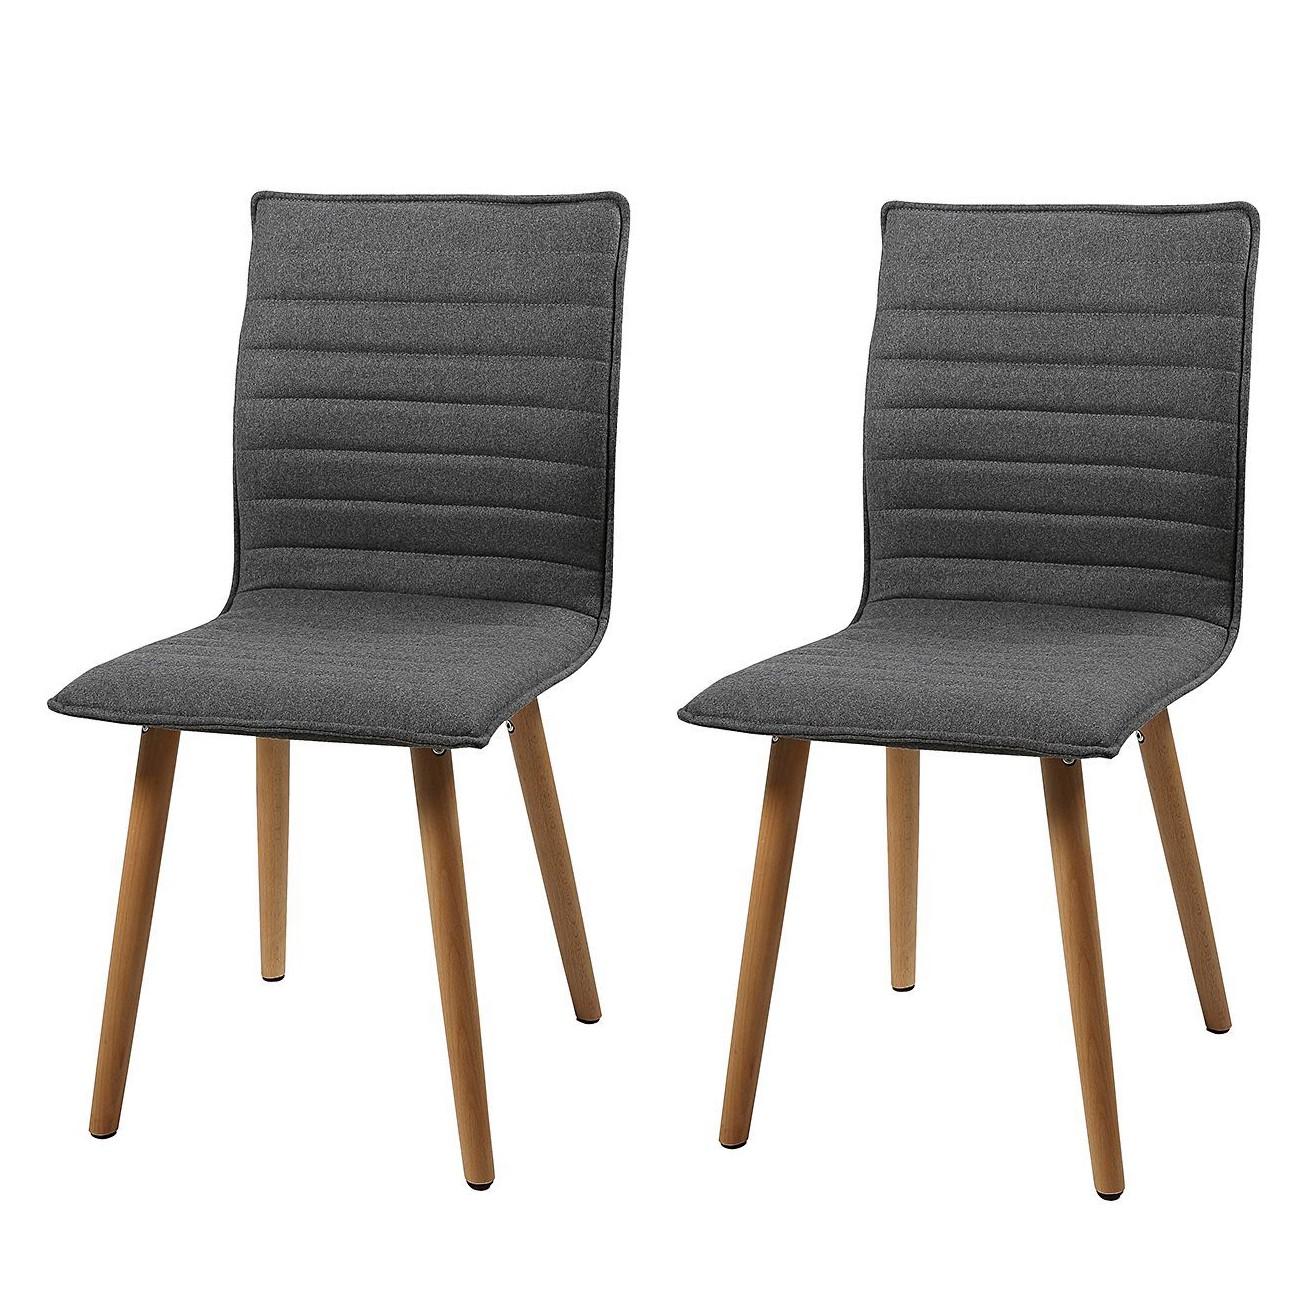 Morteens Möbel polsterstuhl volda webstoff grau morteens möbel preiswert